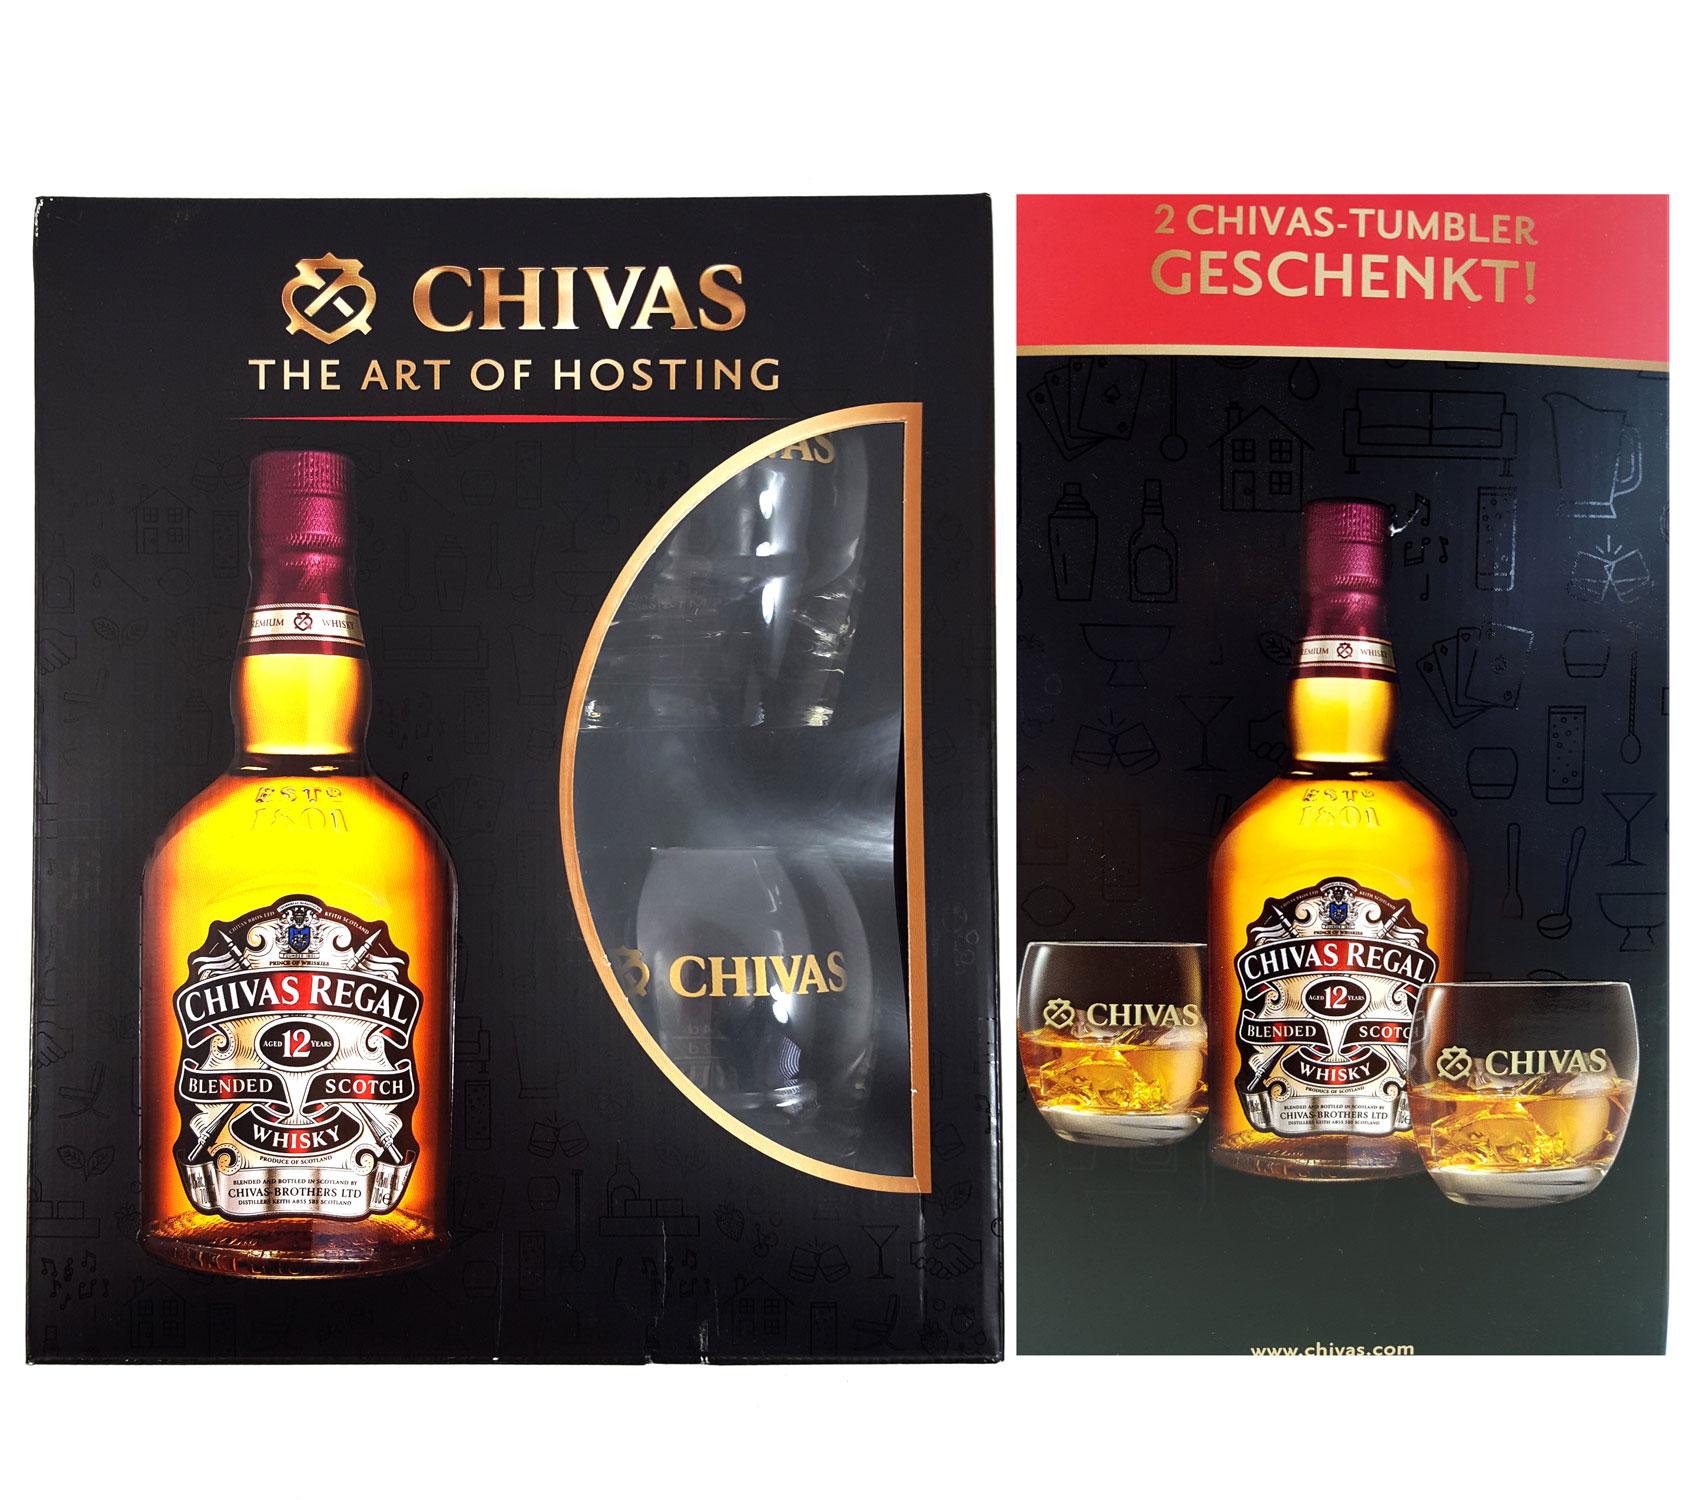 Chivas Blended Scotch Whisky 0,7l 700ml (40% Vol) + 2x Tumbler